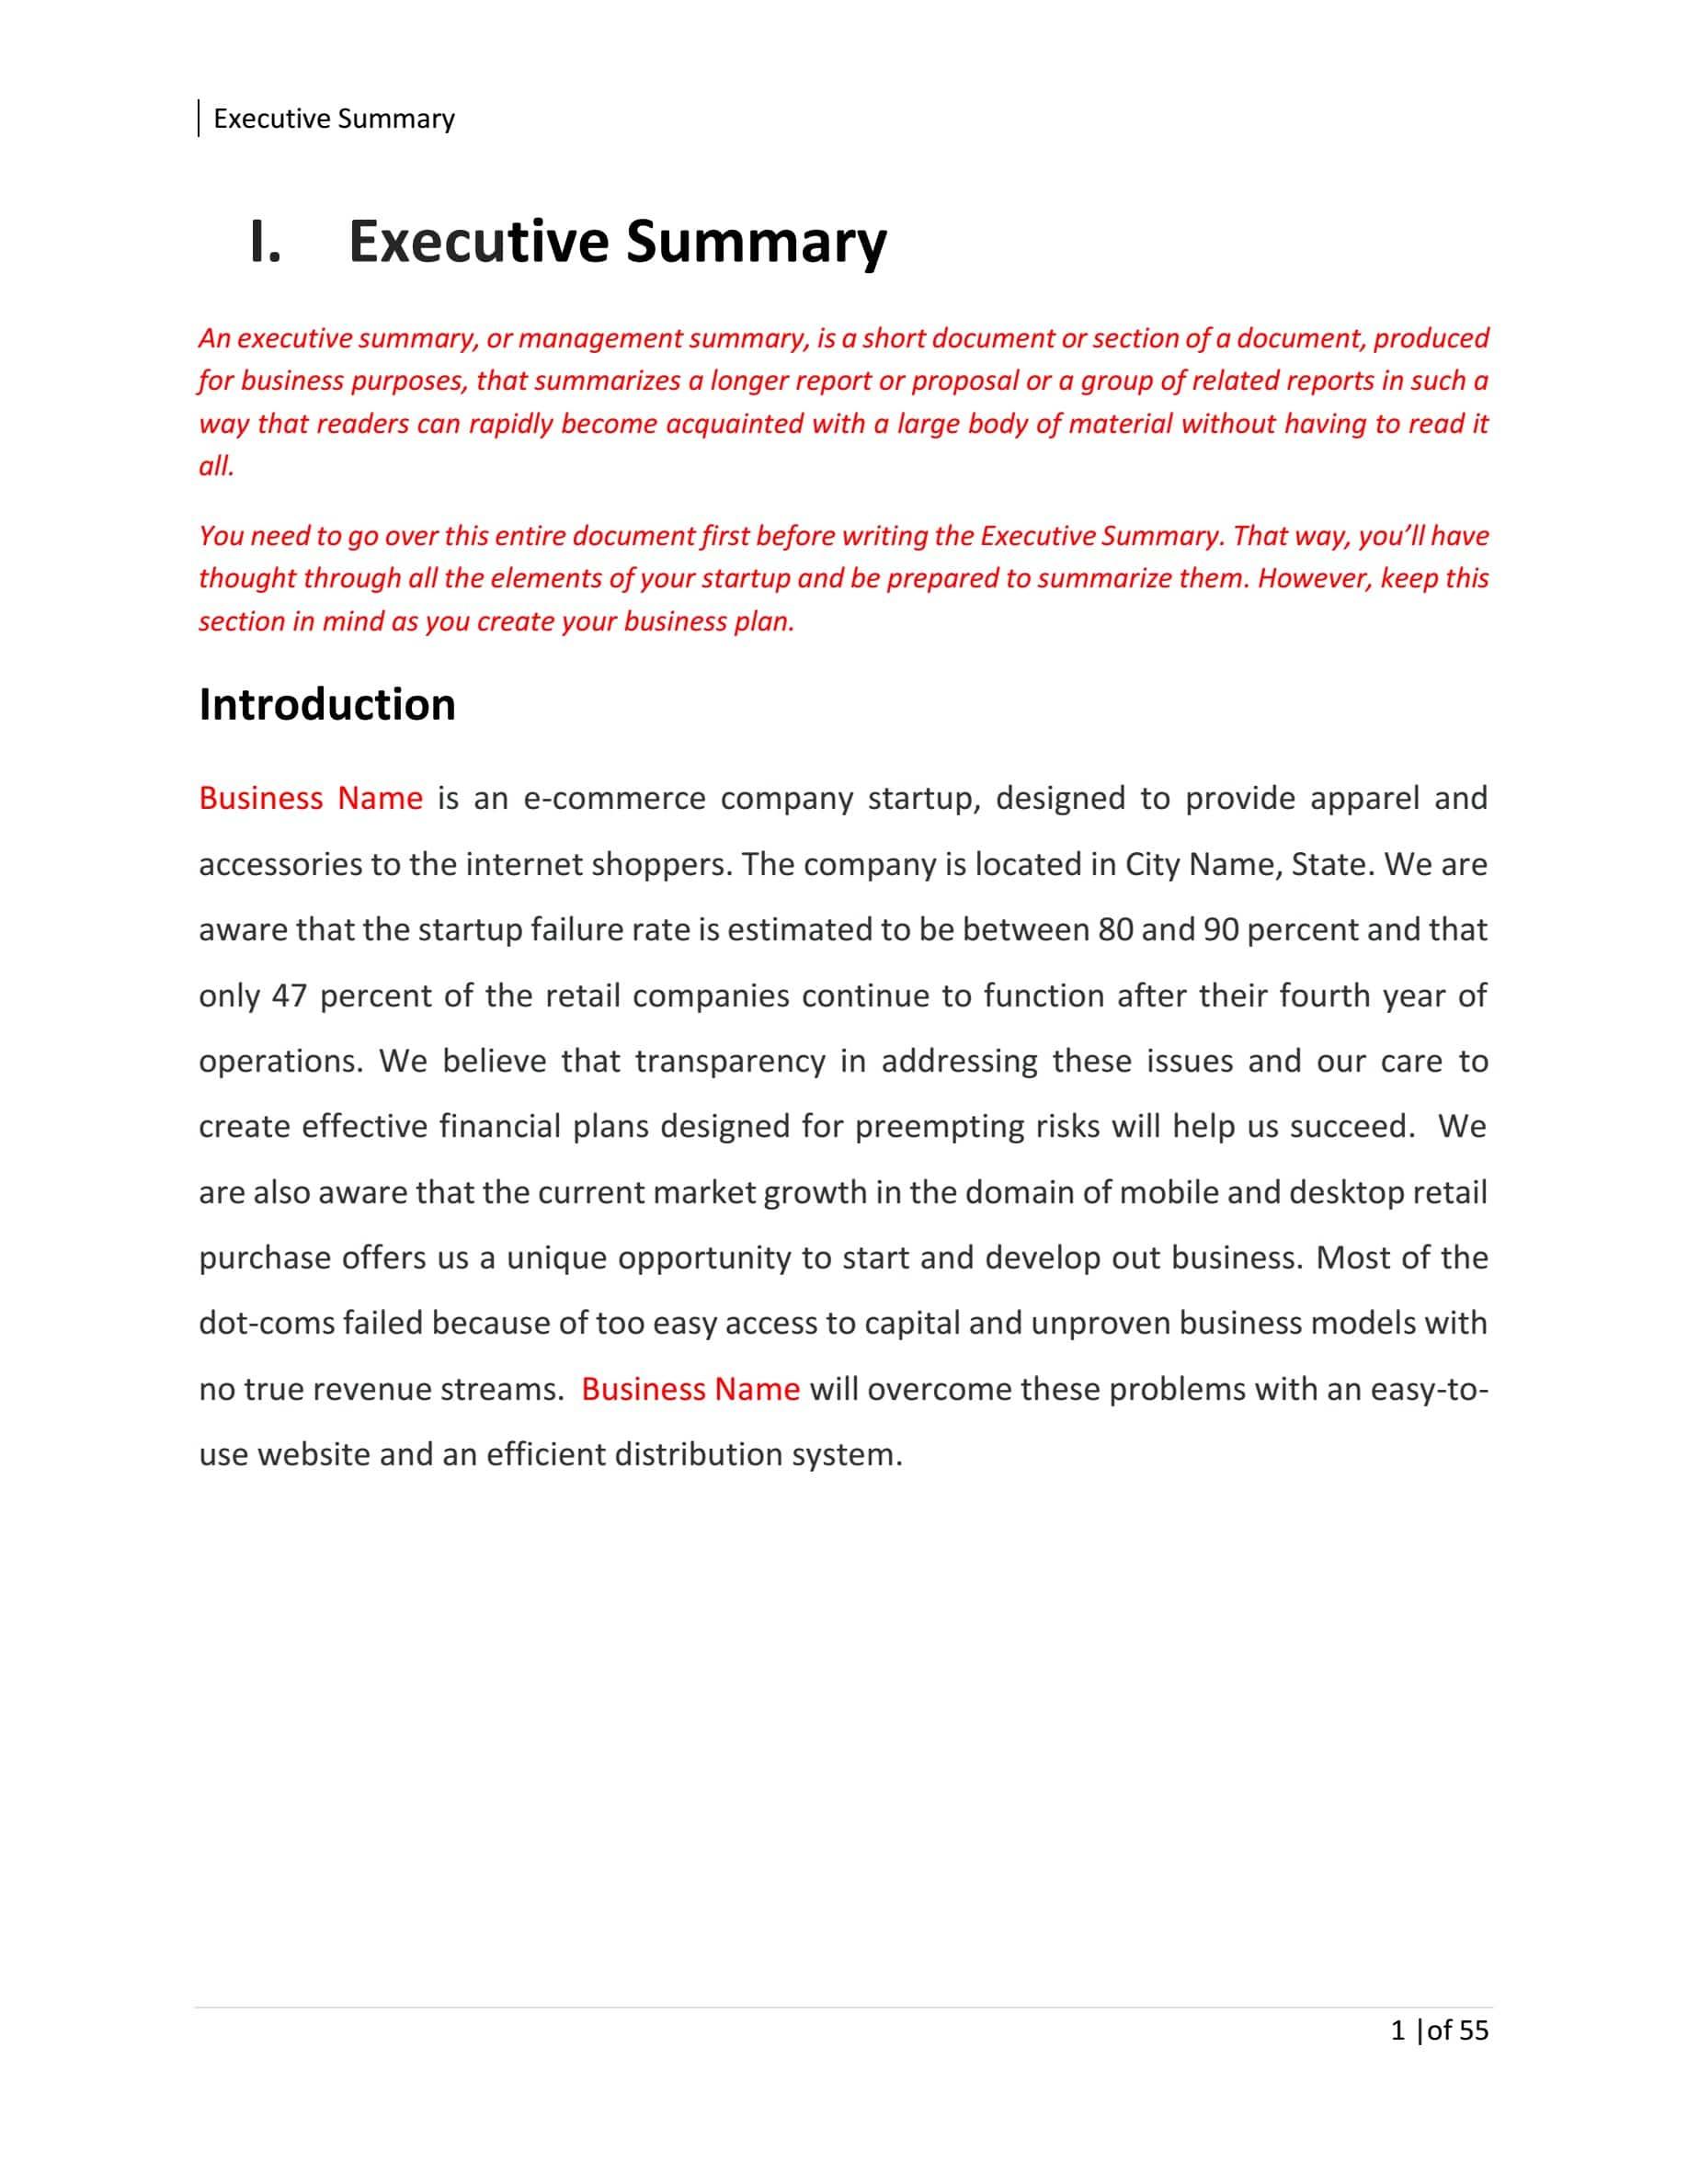 Online Fashion Boutique Business Plan Template Sample Pages - Black